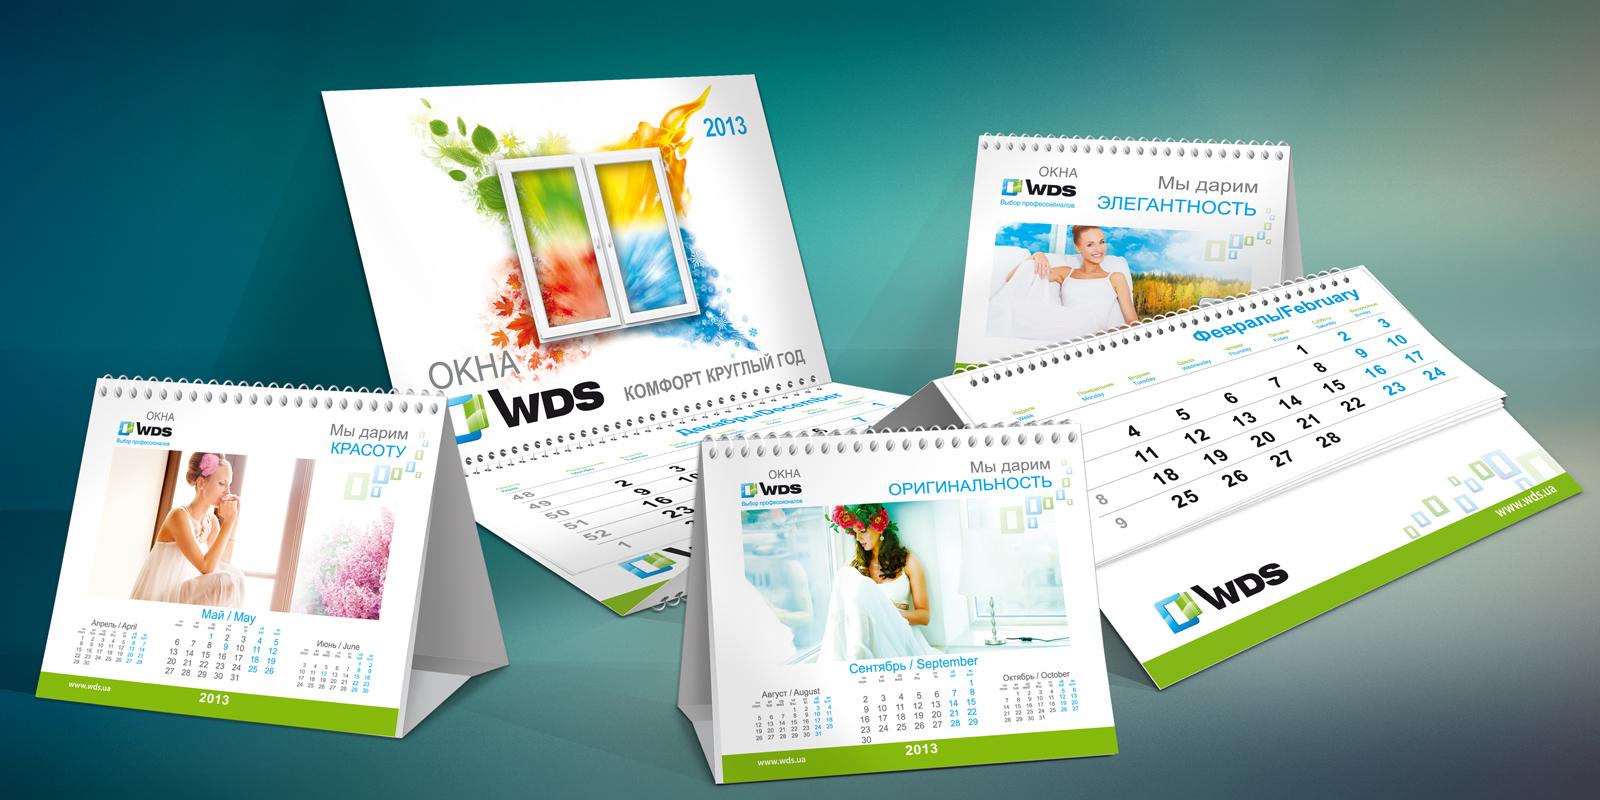 TM WDS;;;;;;Разработка дизайна календаря для TM WDS;;;;;;<span>Клиент:</span> Компания «МИРОПЛАСТ»;;;;;;;;;;;;Разработка дизайна календаря для TM WDS;;;;;;5